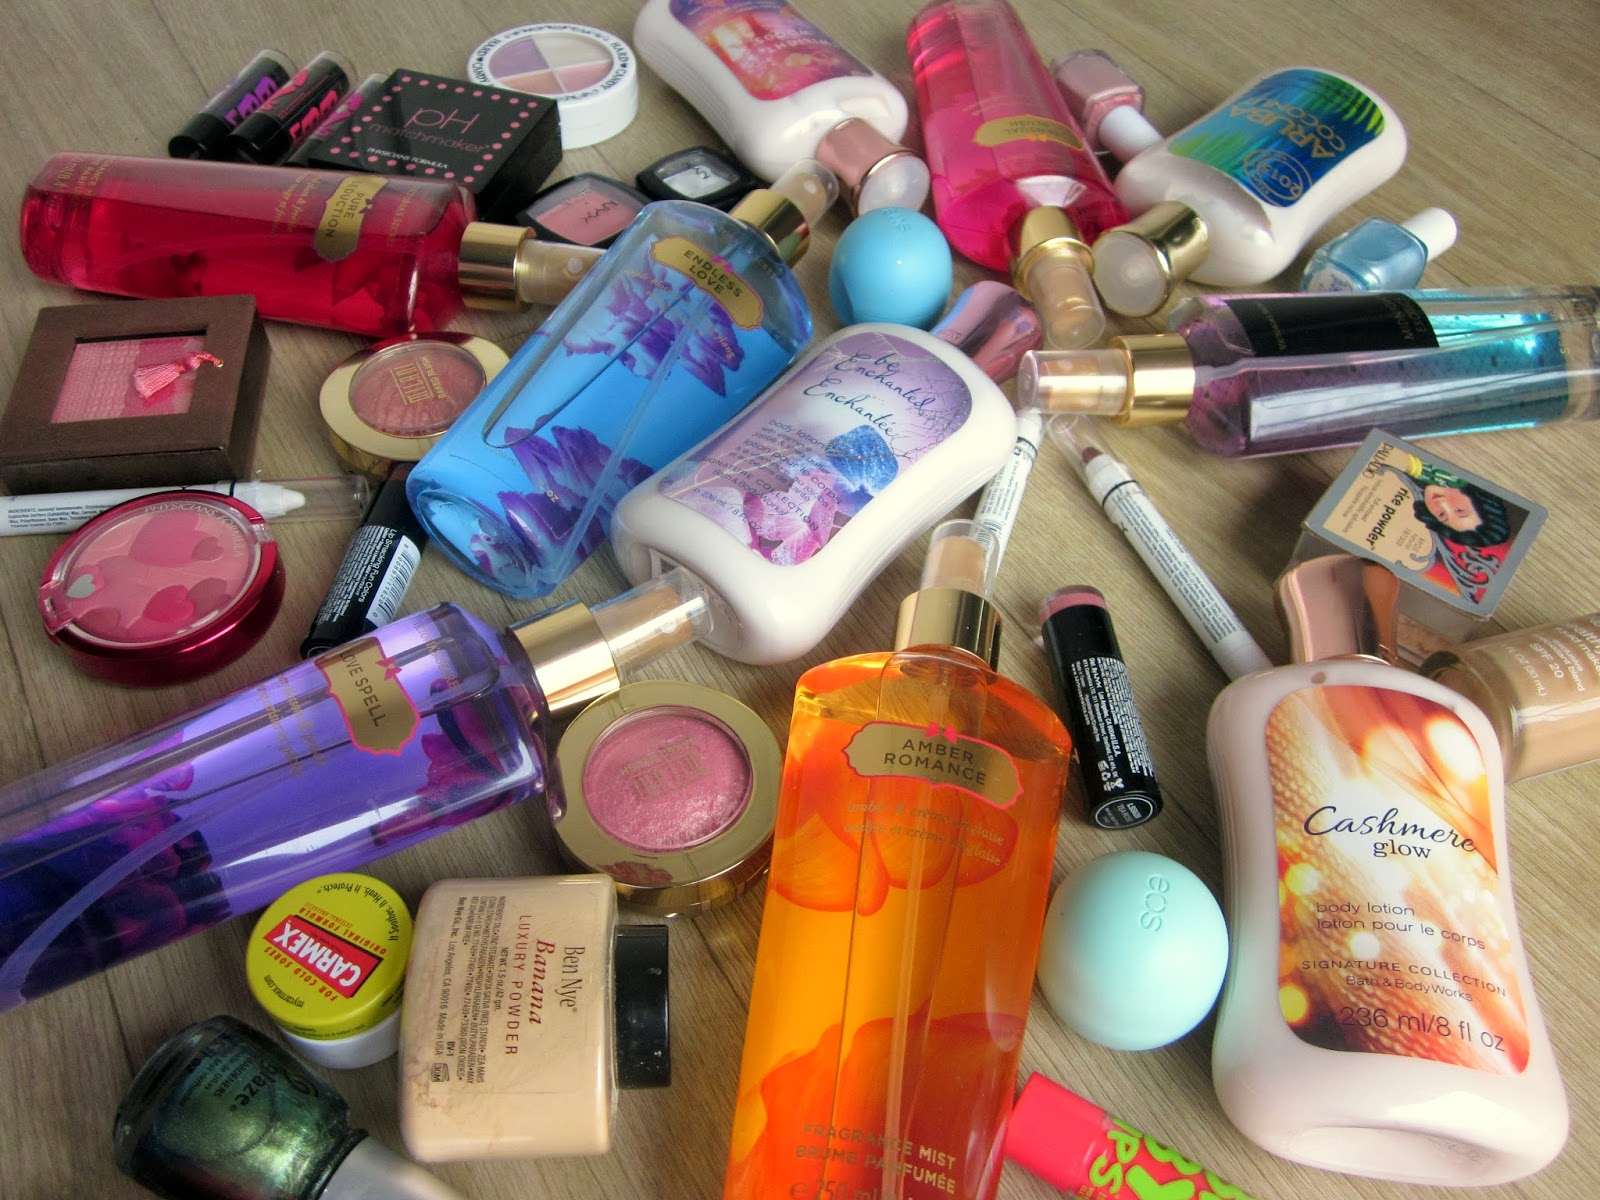 cosmetique americain